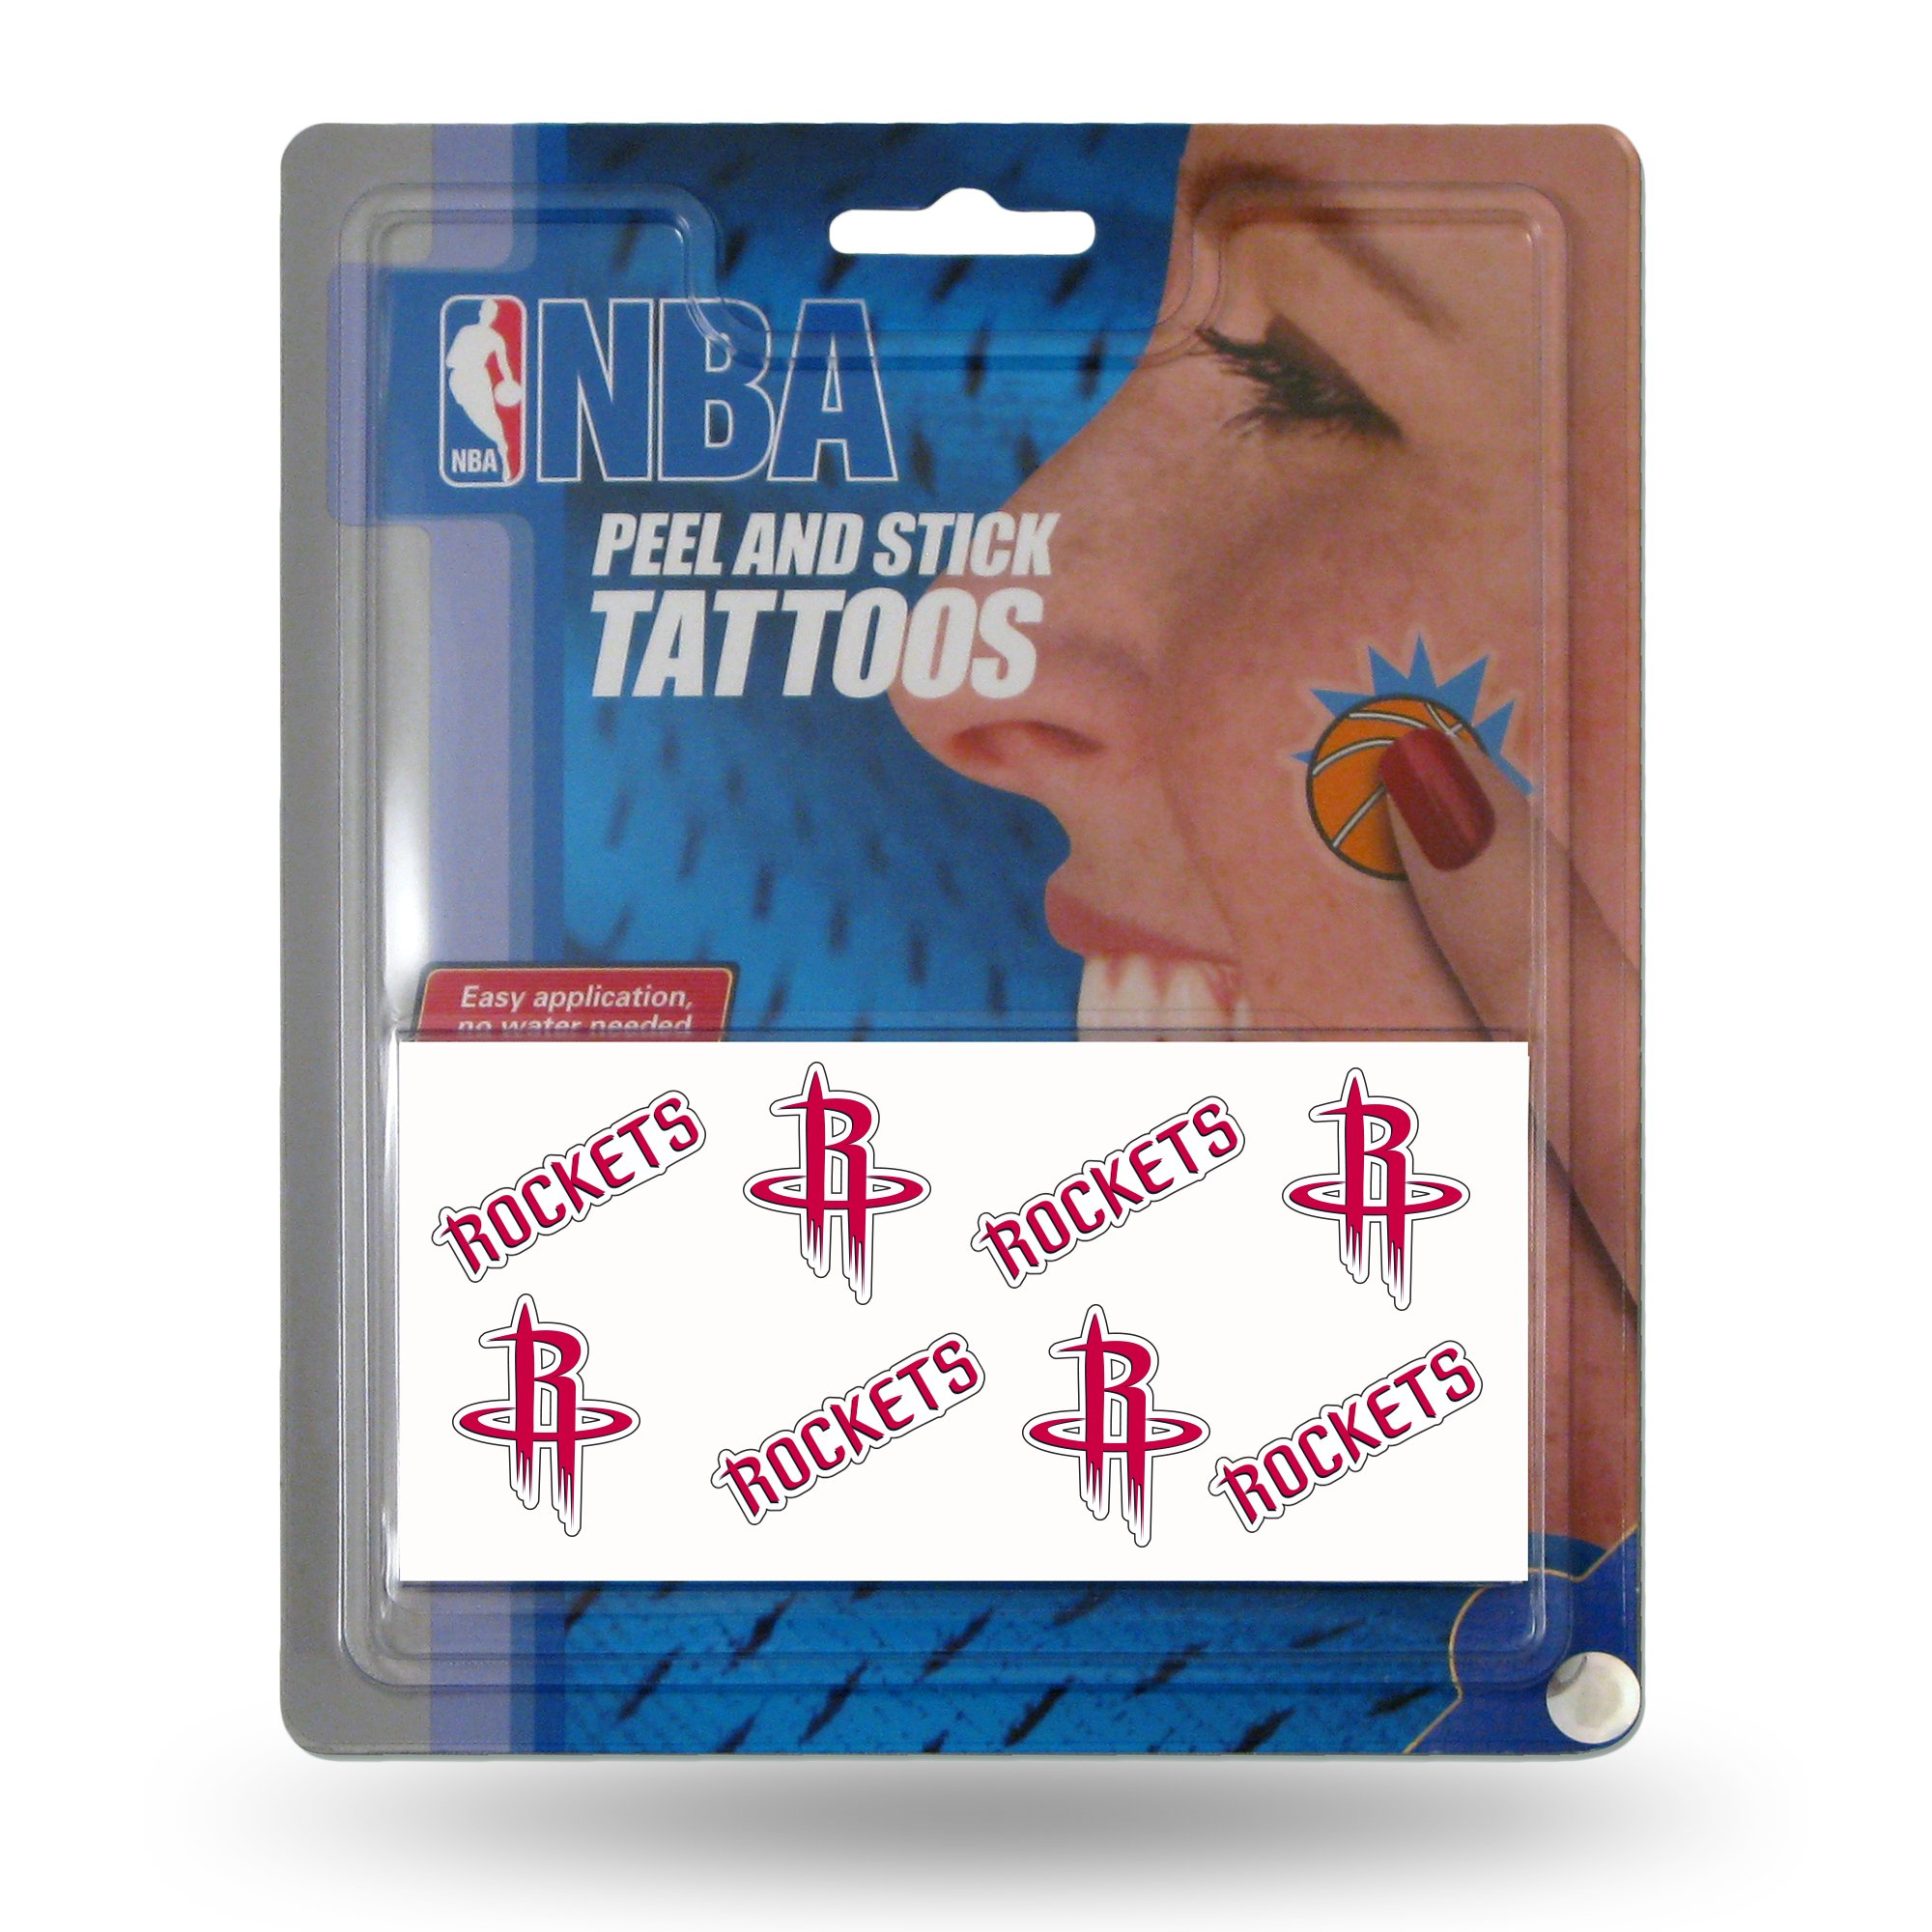 NBA Houston Rockets Face Tattoos, 8-Piece Set